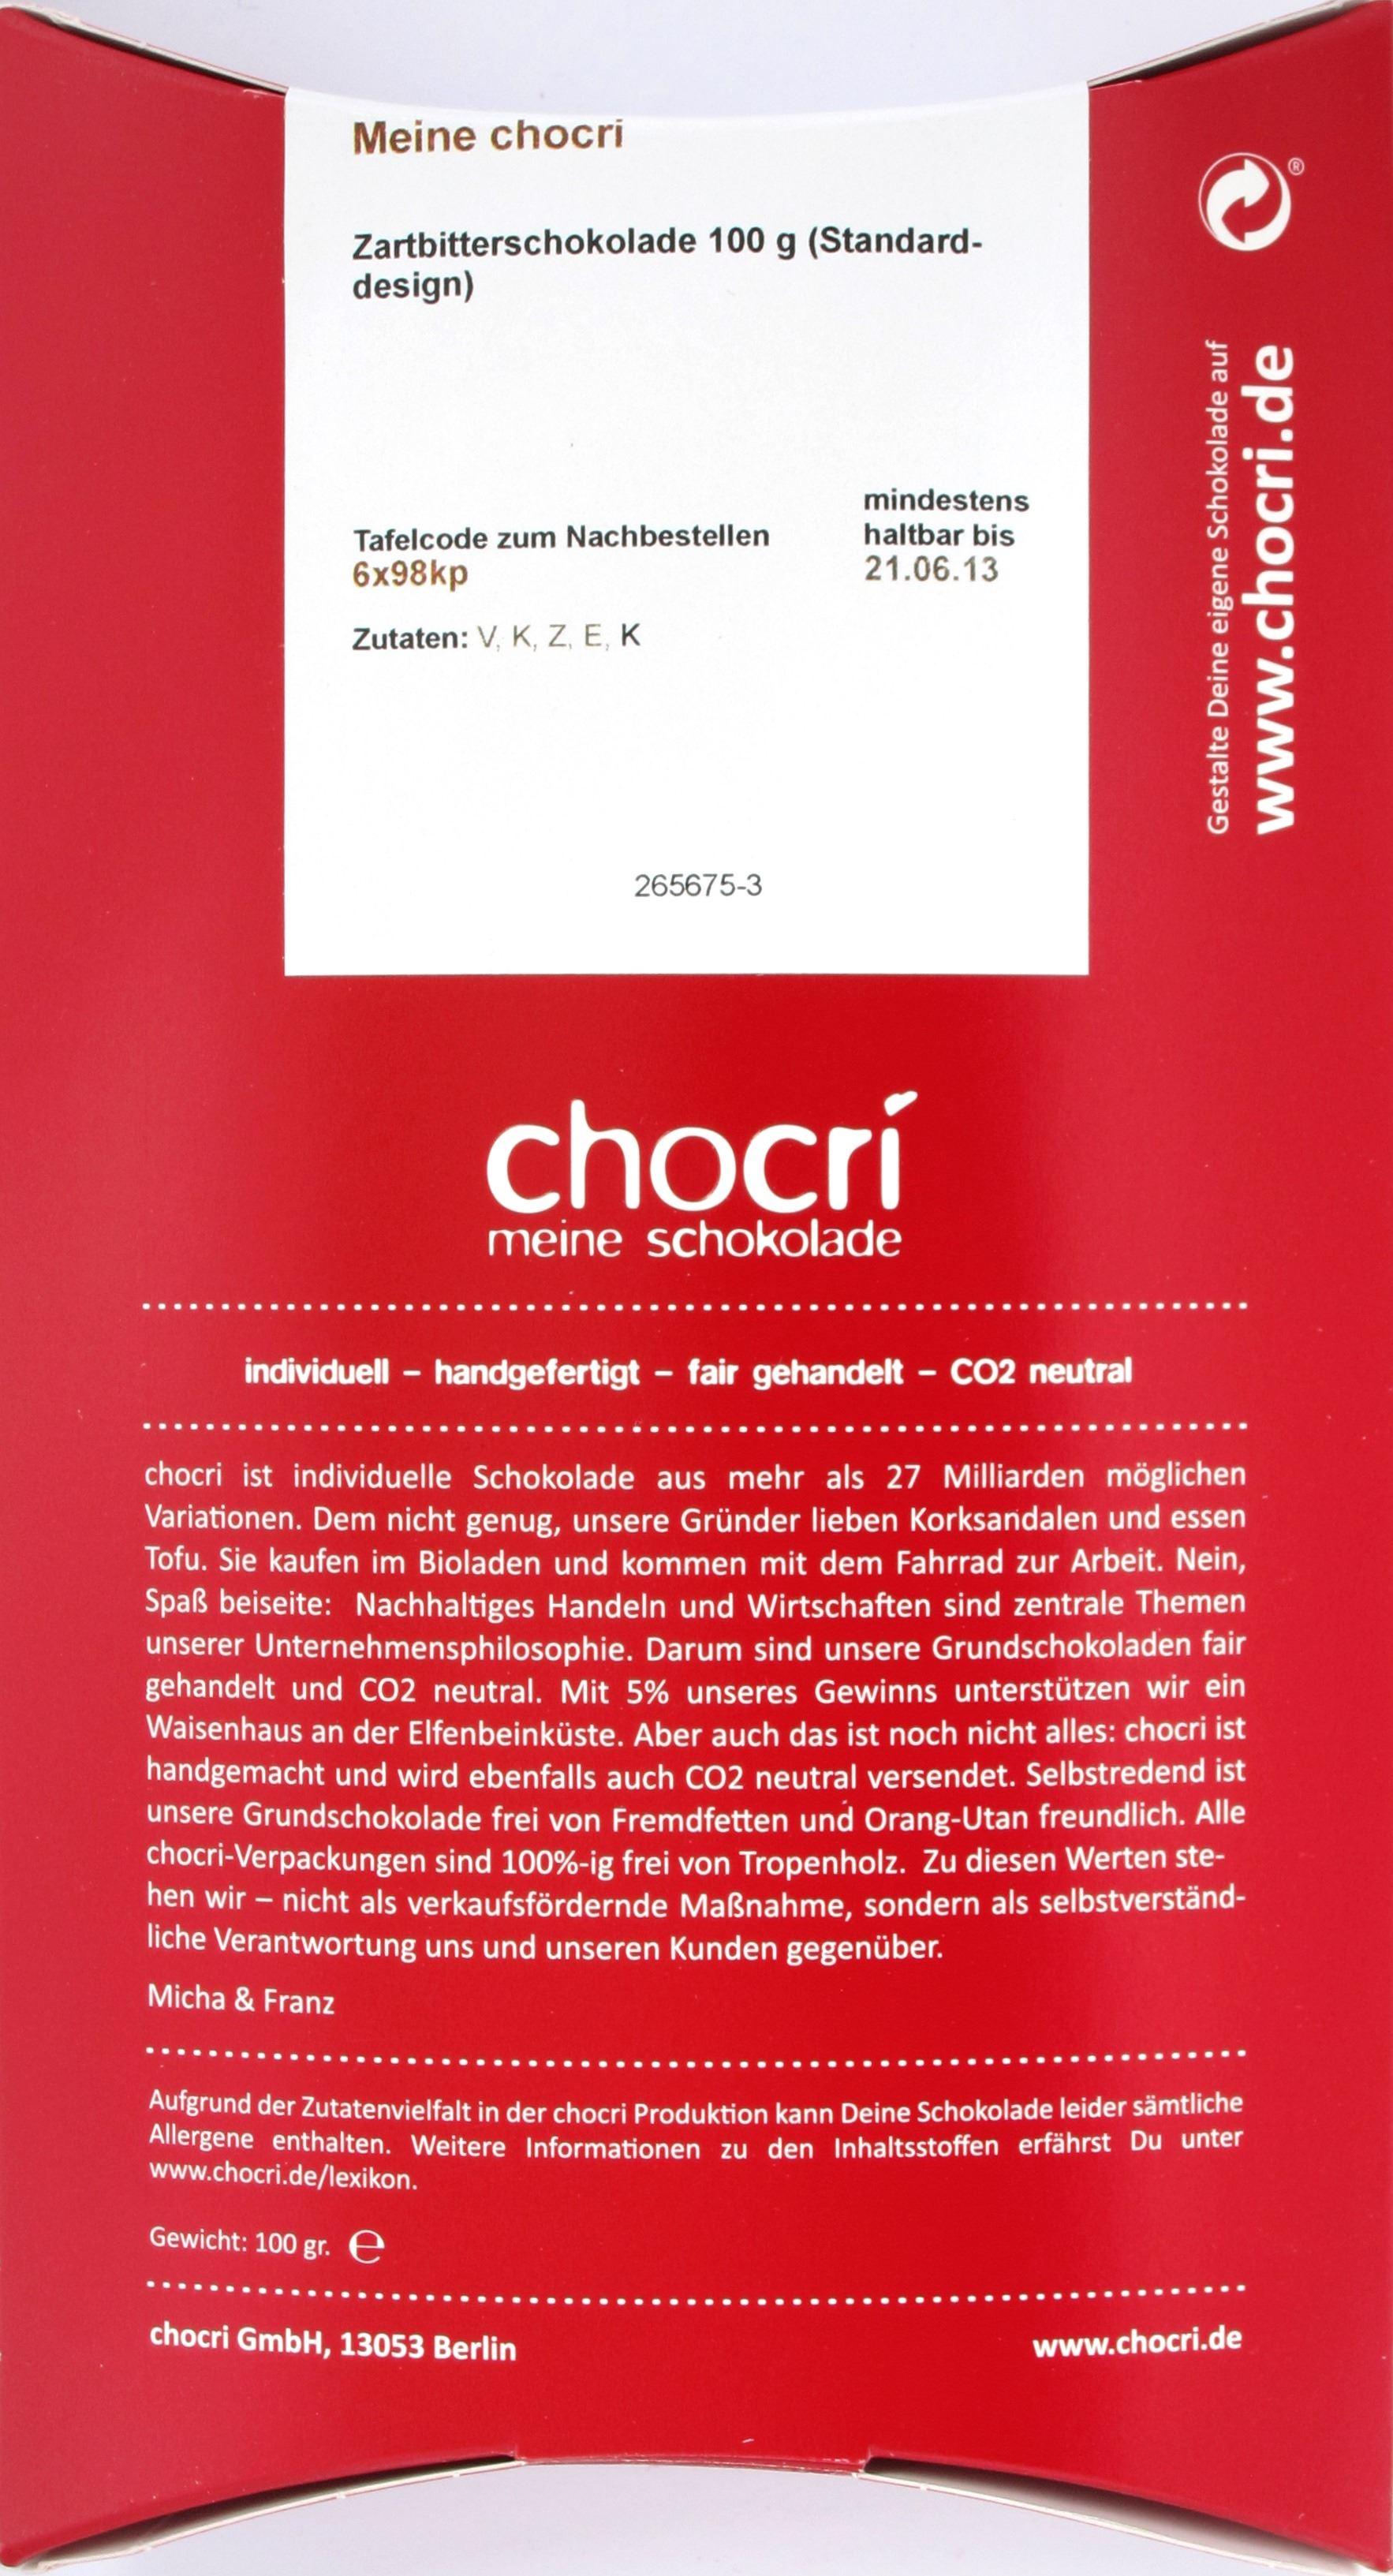 Chocri Zartbitterschokolade, Rückseite